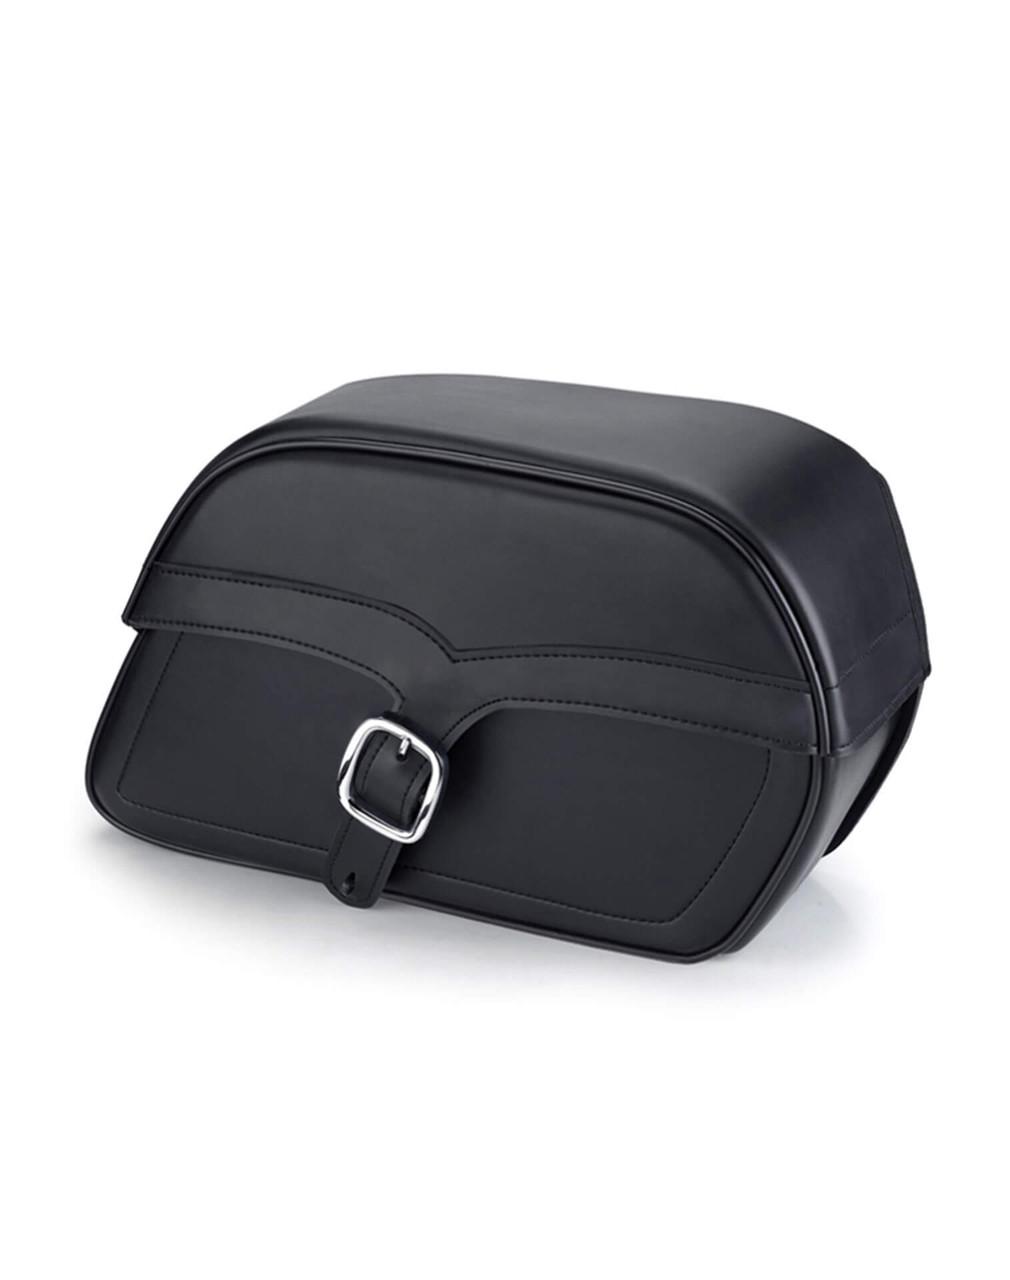 Viking Slant Motorcycle Medium Saddlebags For Harley Softail Springer FXSTS Main Bag View